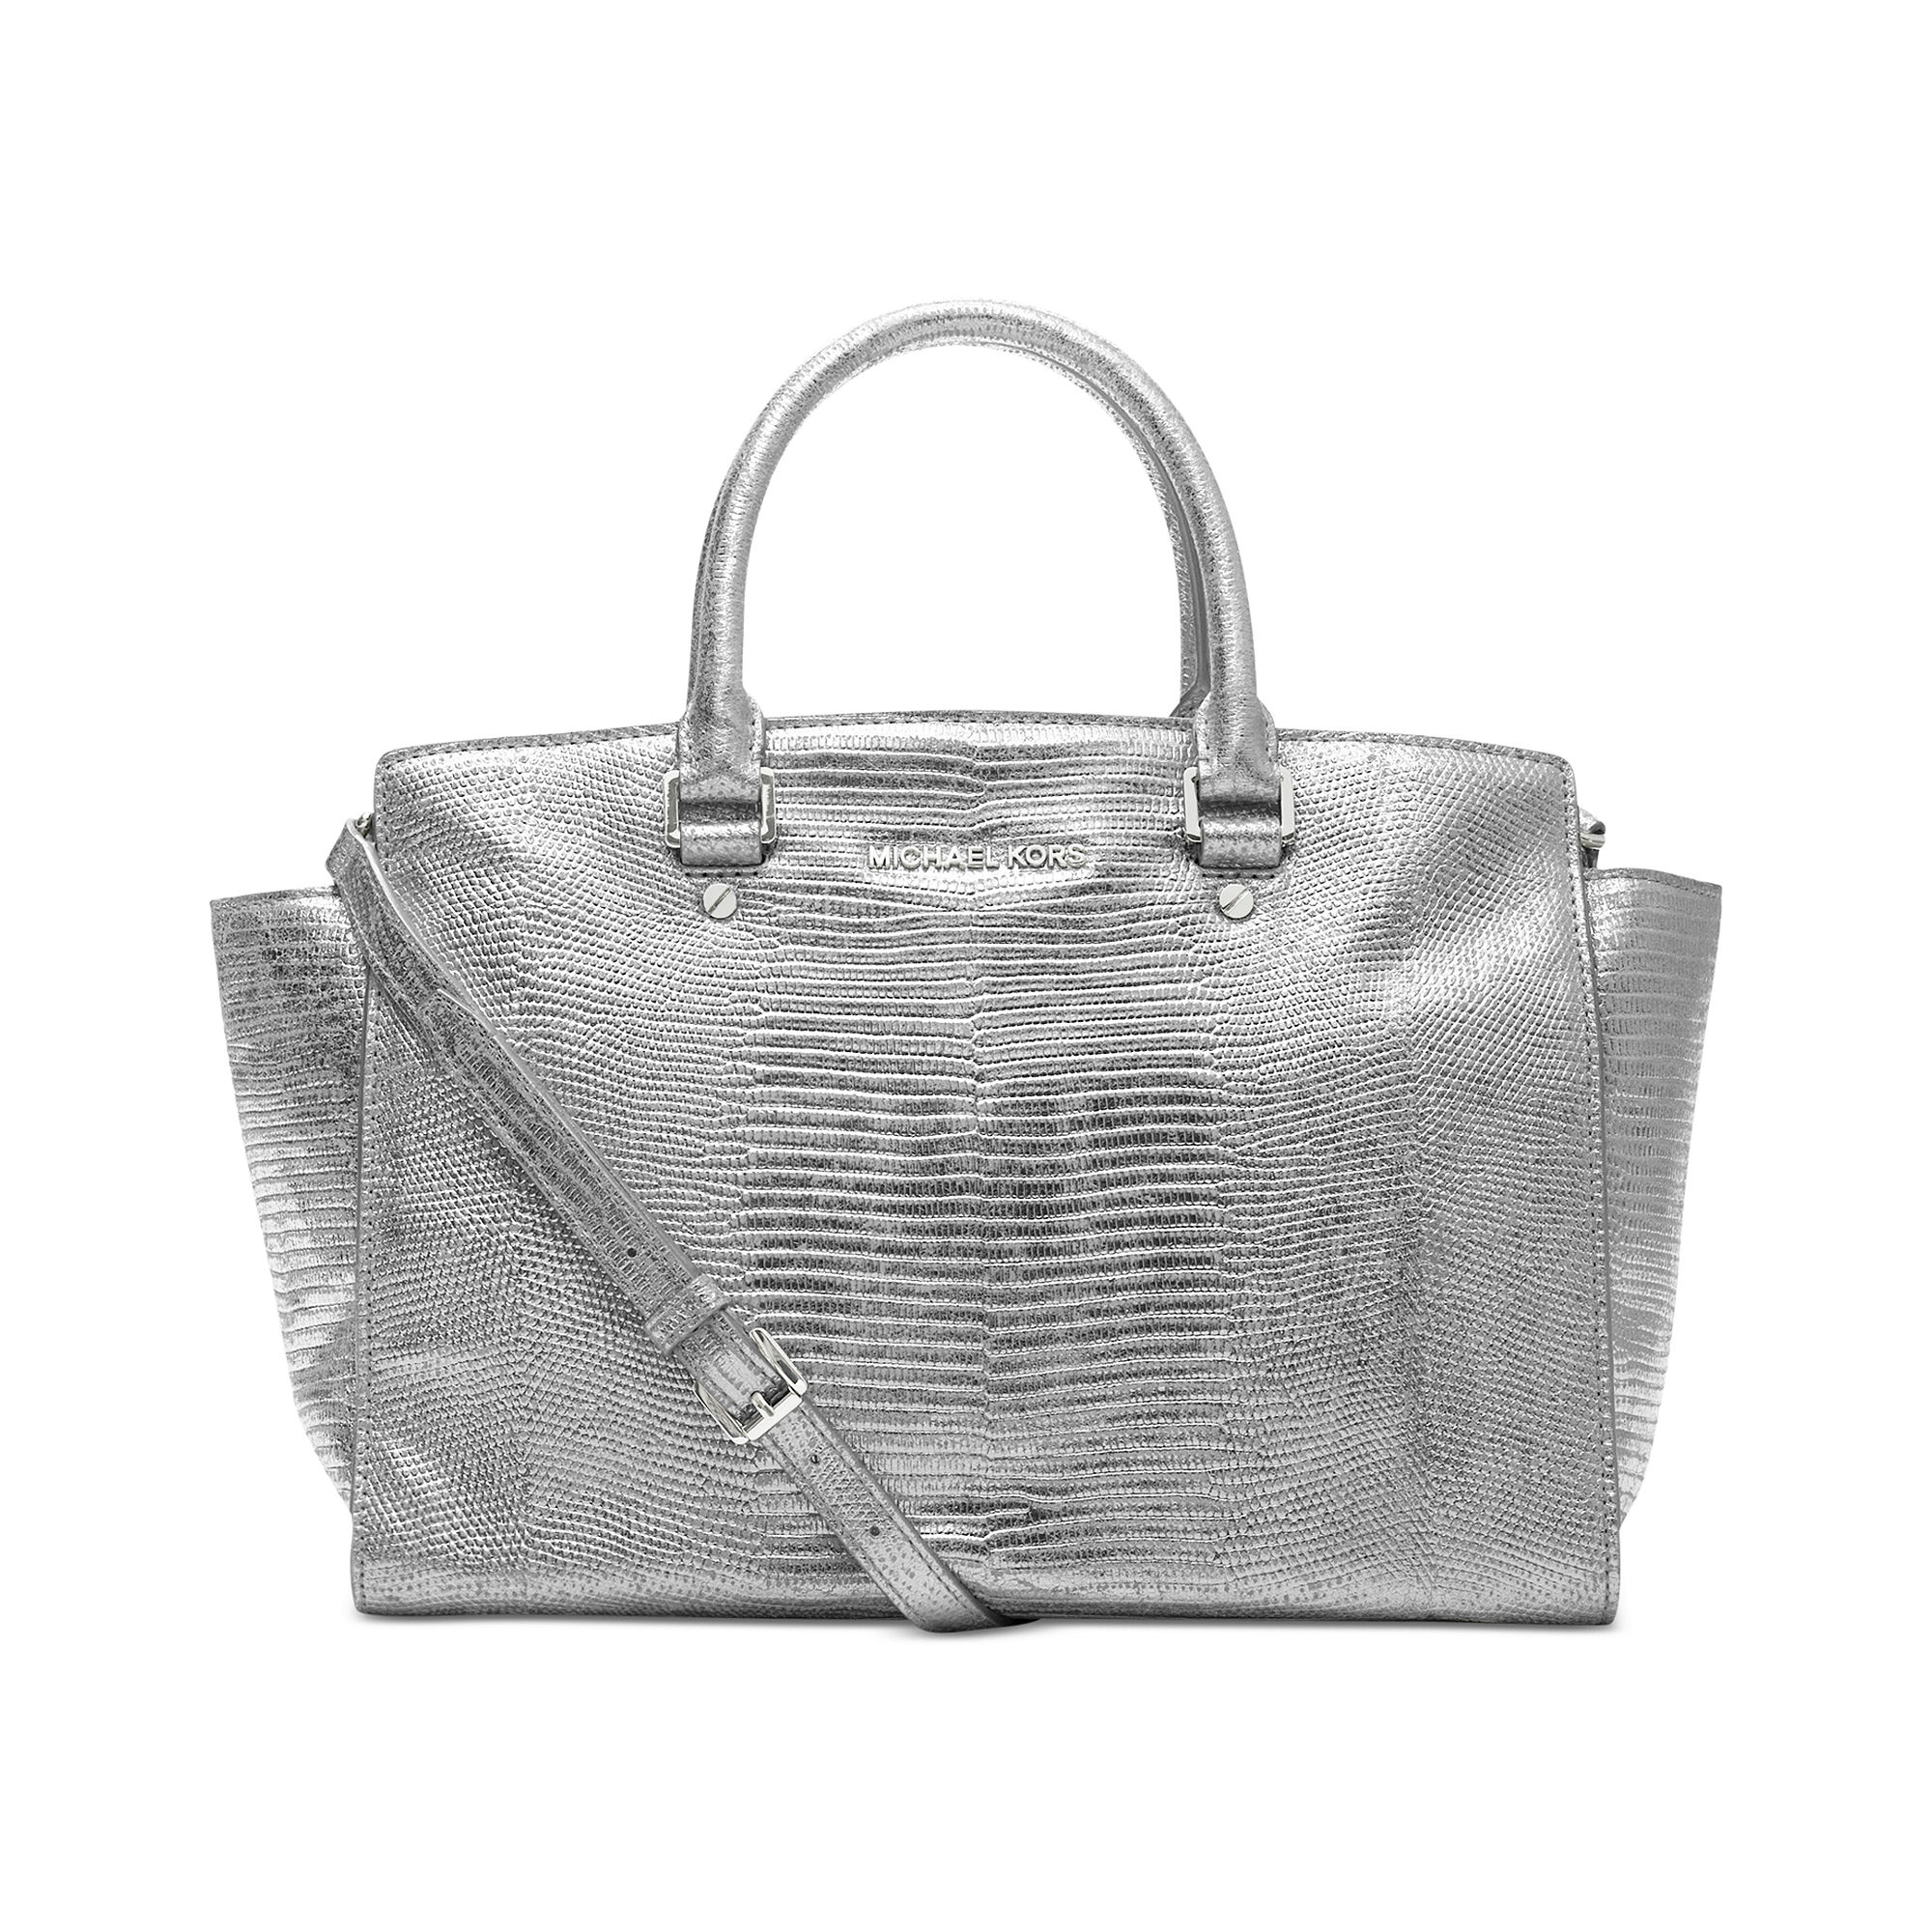 michael kors selma large metallic satchel in silver lyst. Black Bedroom Furniture Sets. Home Design Ideas